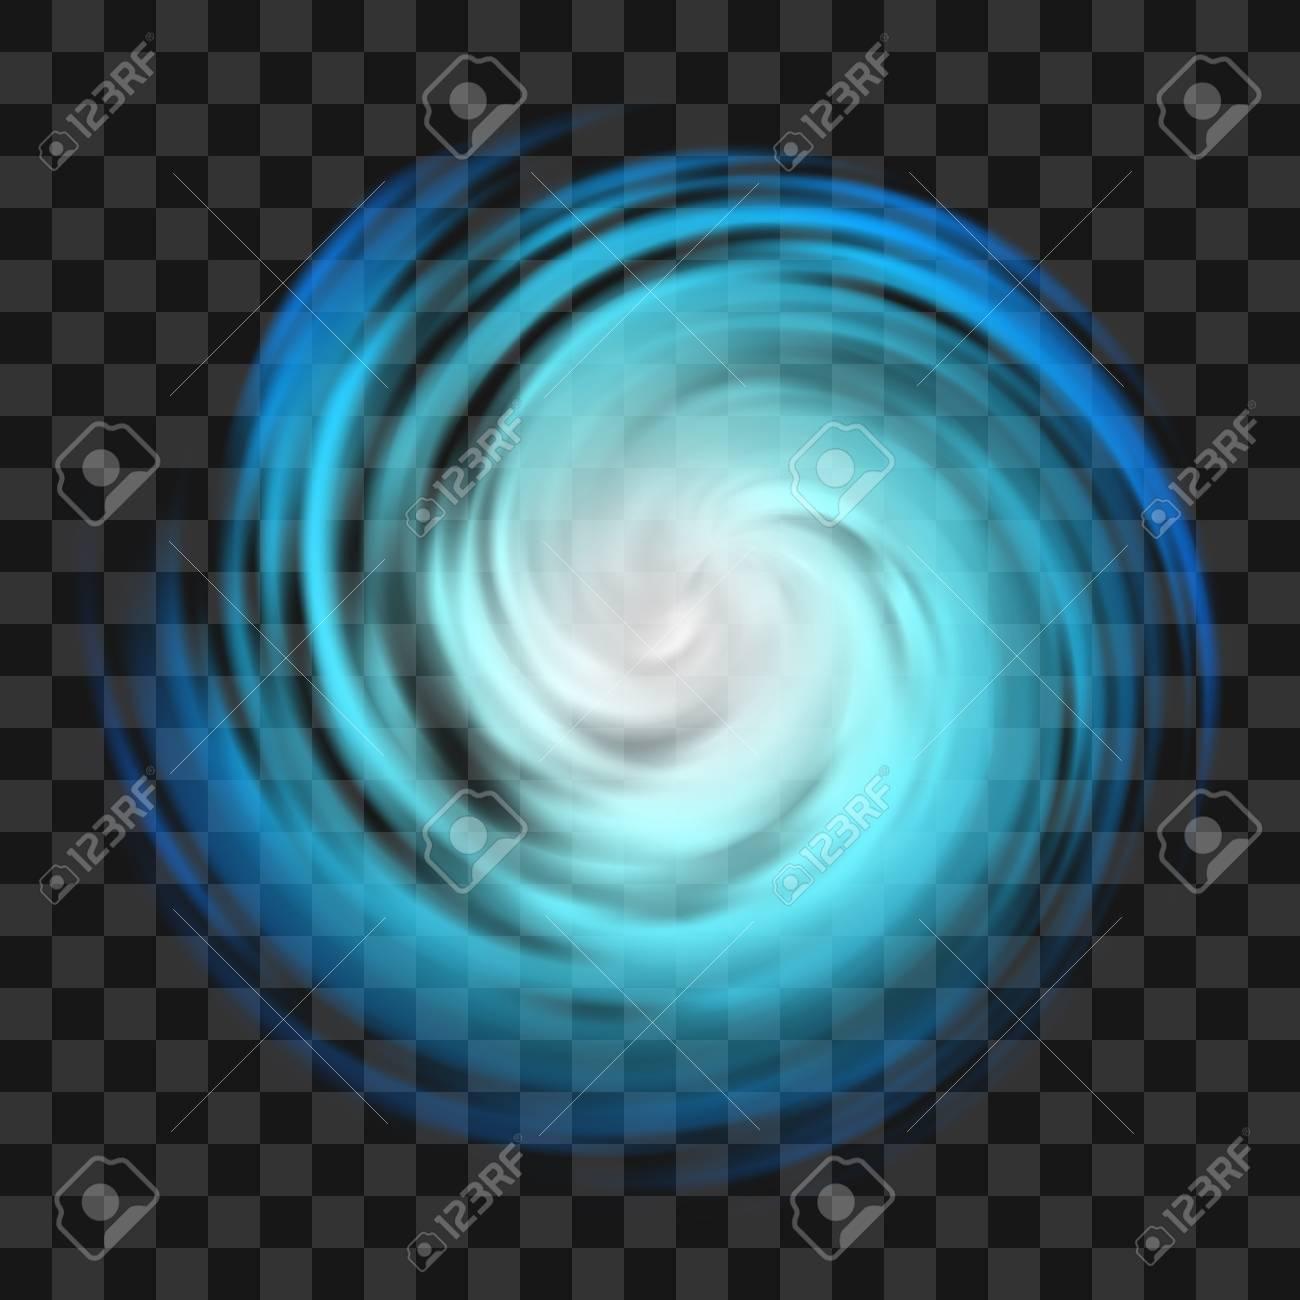 Blue hurricane symbol, tornado, typhoon, white swirl clouds, twister on dark transparent background, top view. Danger cyclone vector illustration, icon, logo, web infographic - 108161686